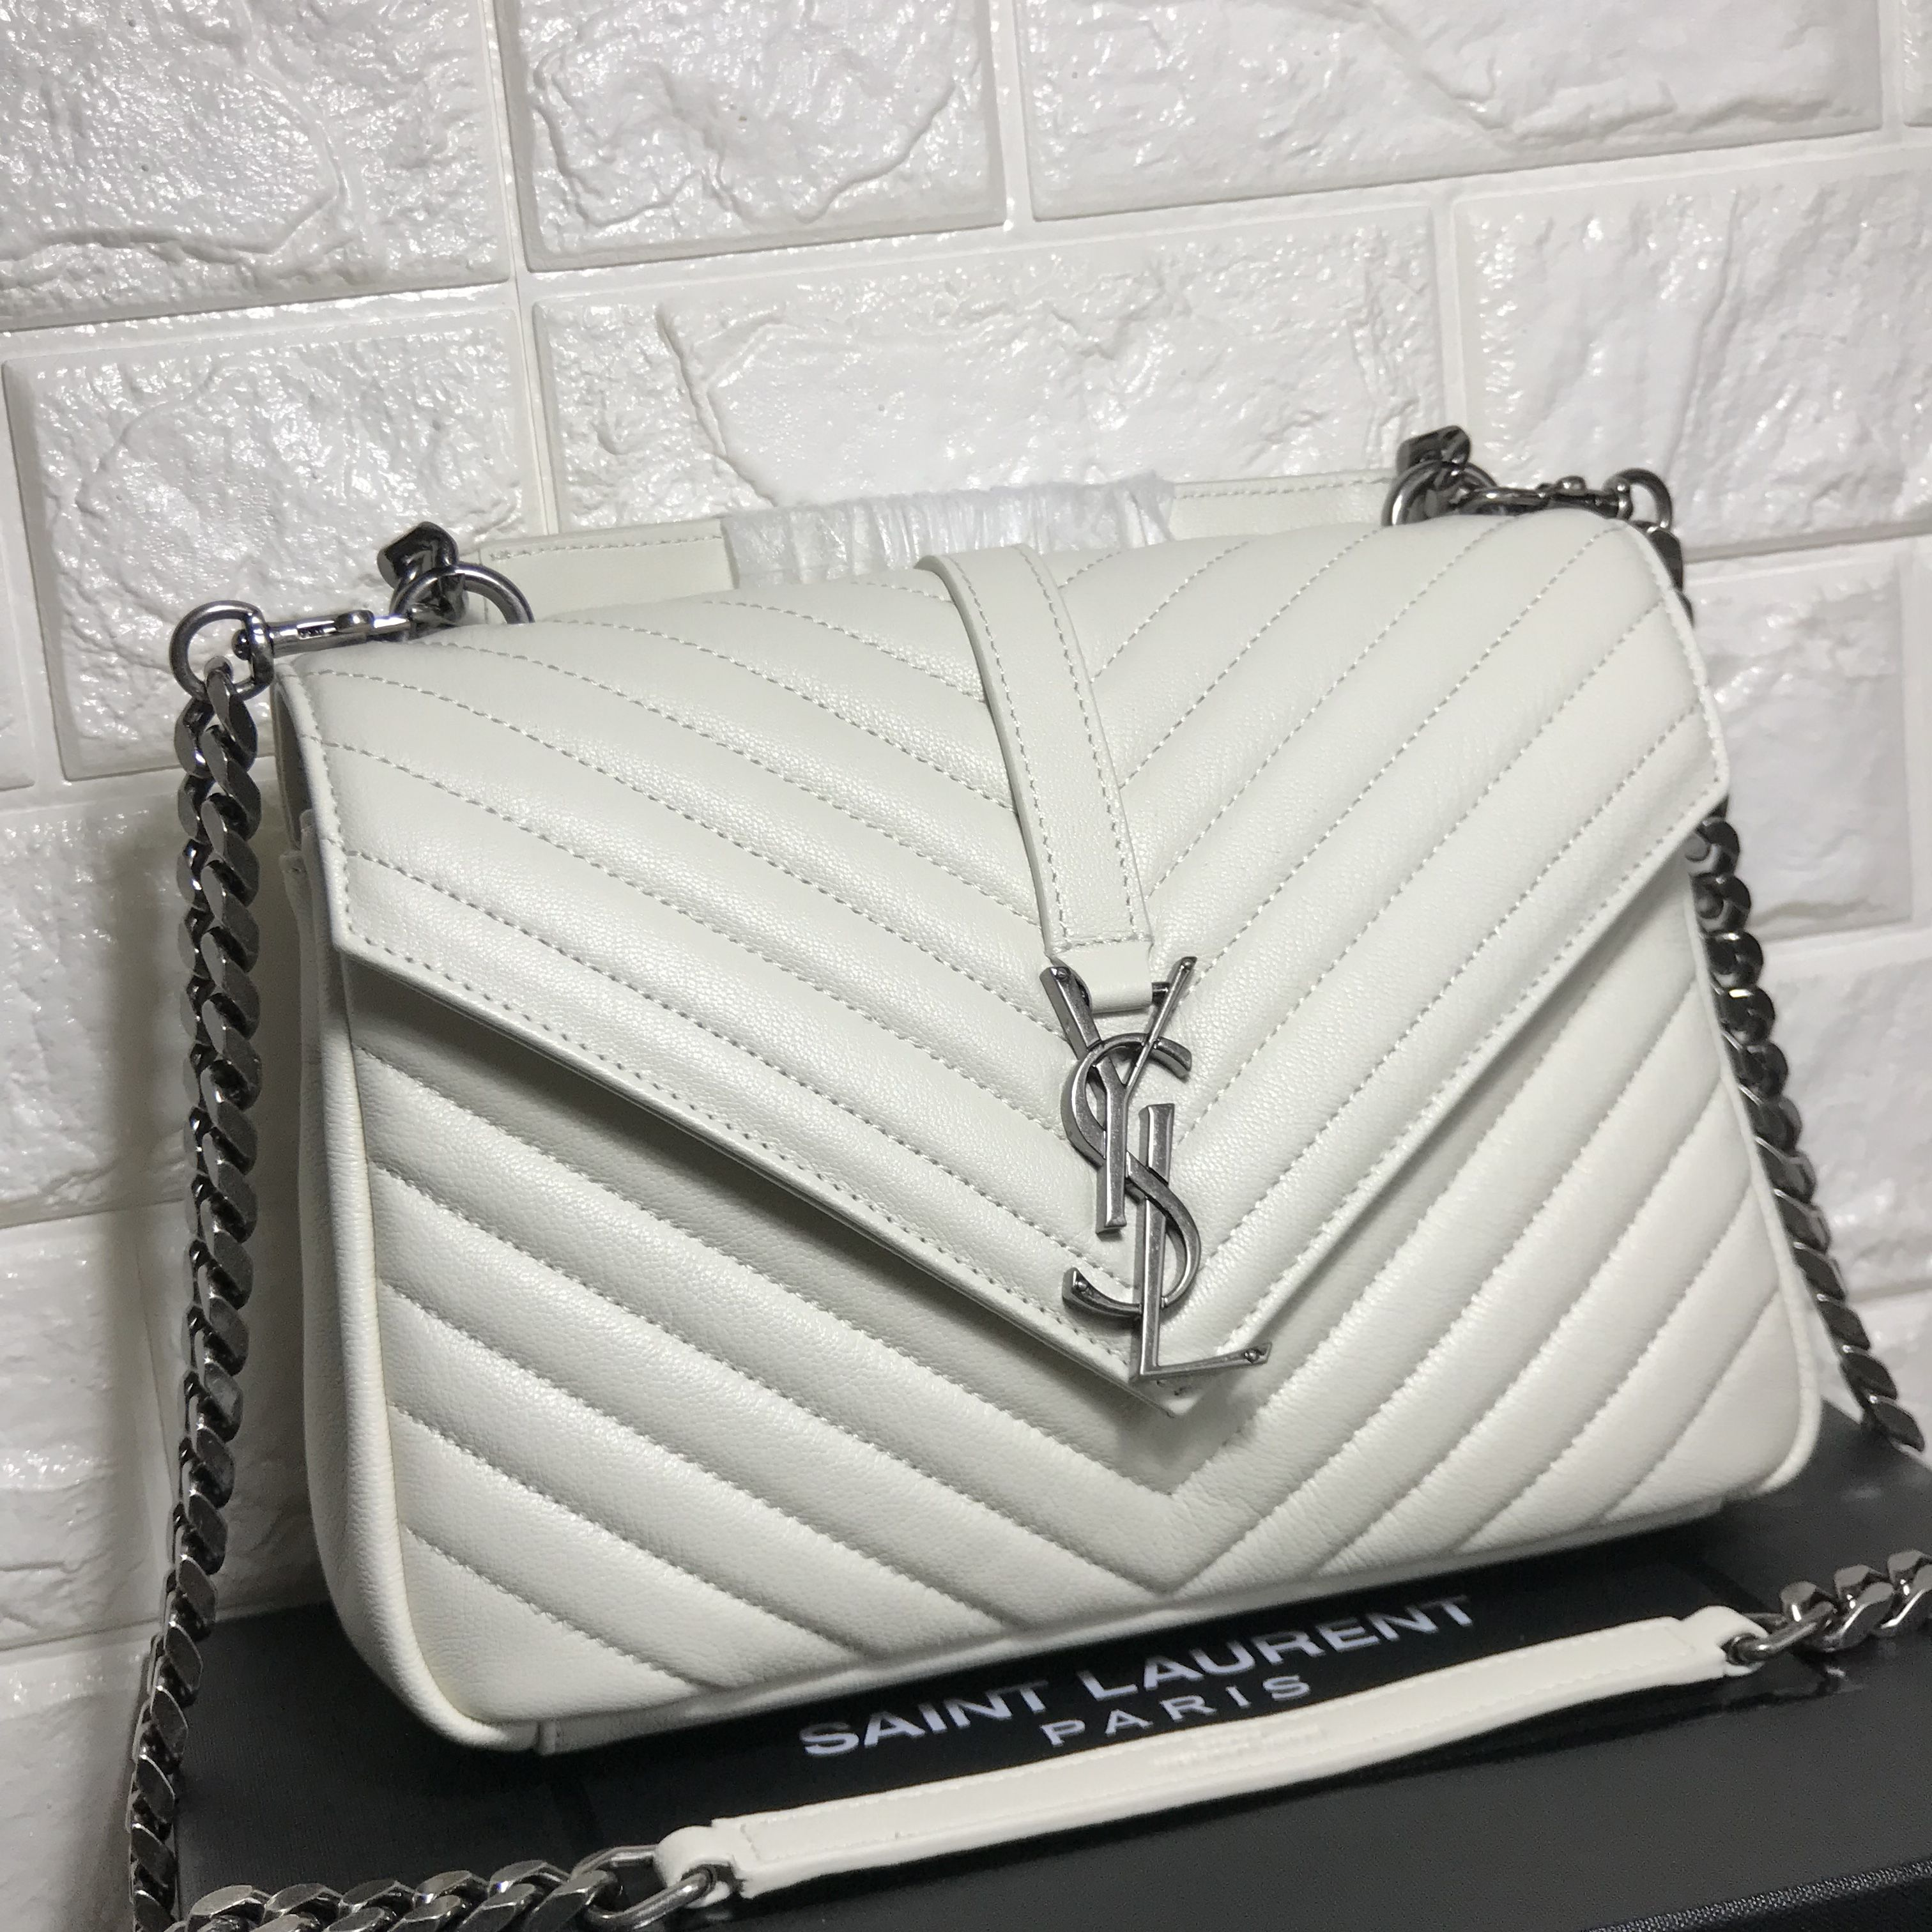 b78f4b8972a2e Ysl Saint Laurent college chain flap bag 24cm white original leather version